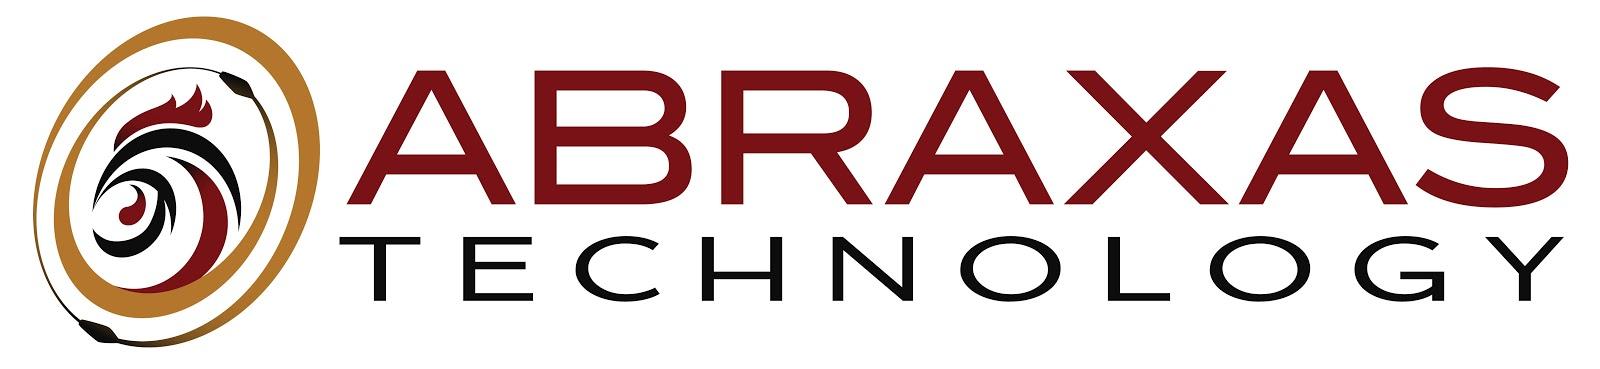 The Abraxas Technology logo